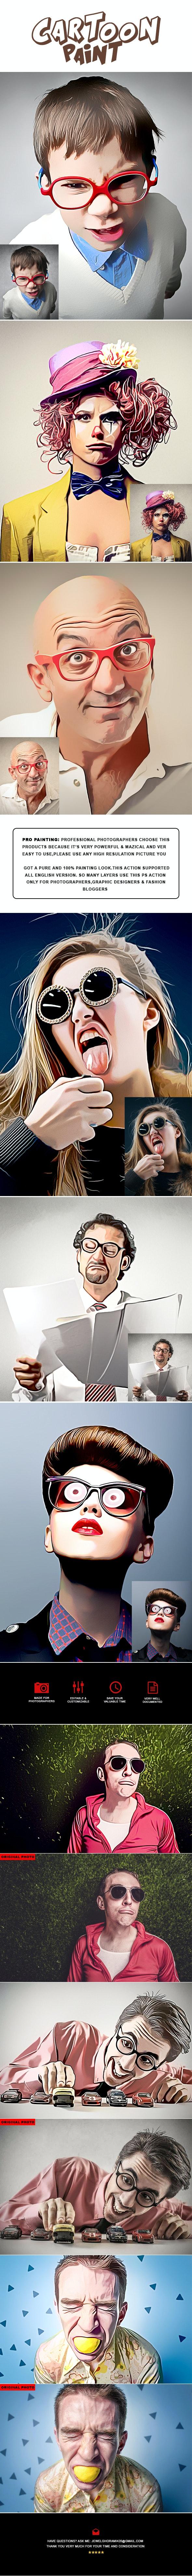 Pro Cartoon Paints Photoshop Action - Photo Effects Actions